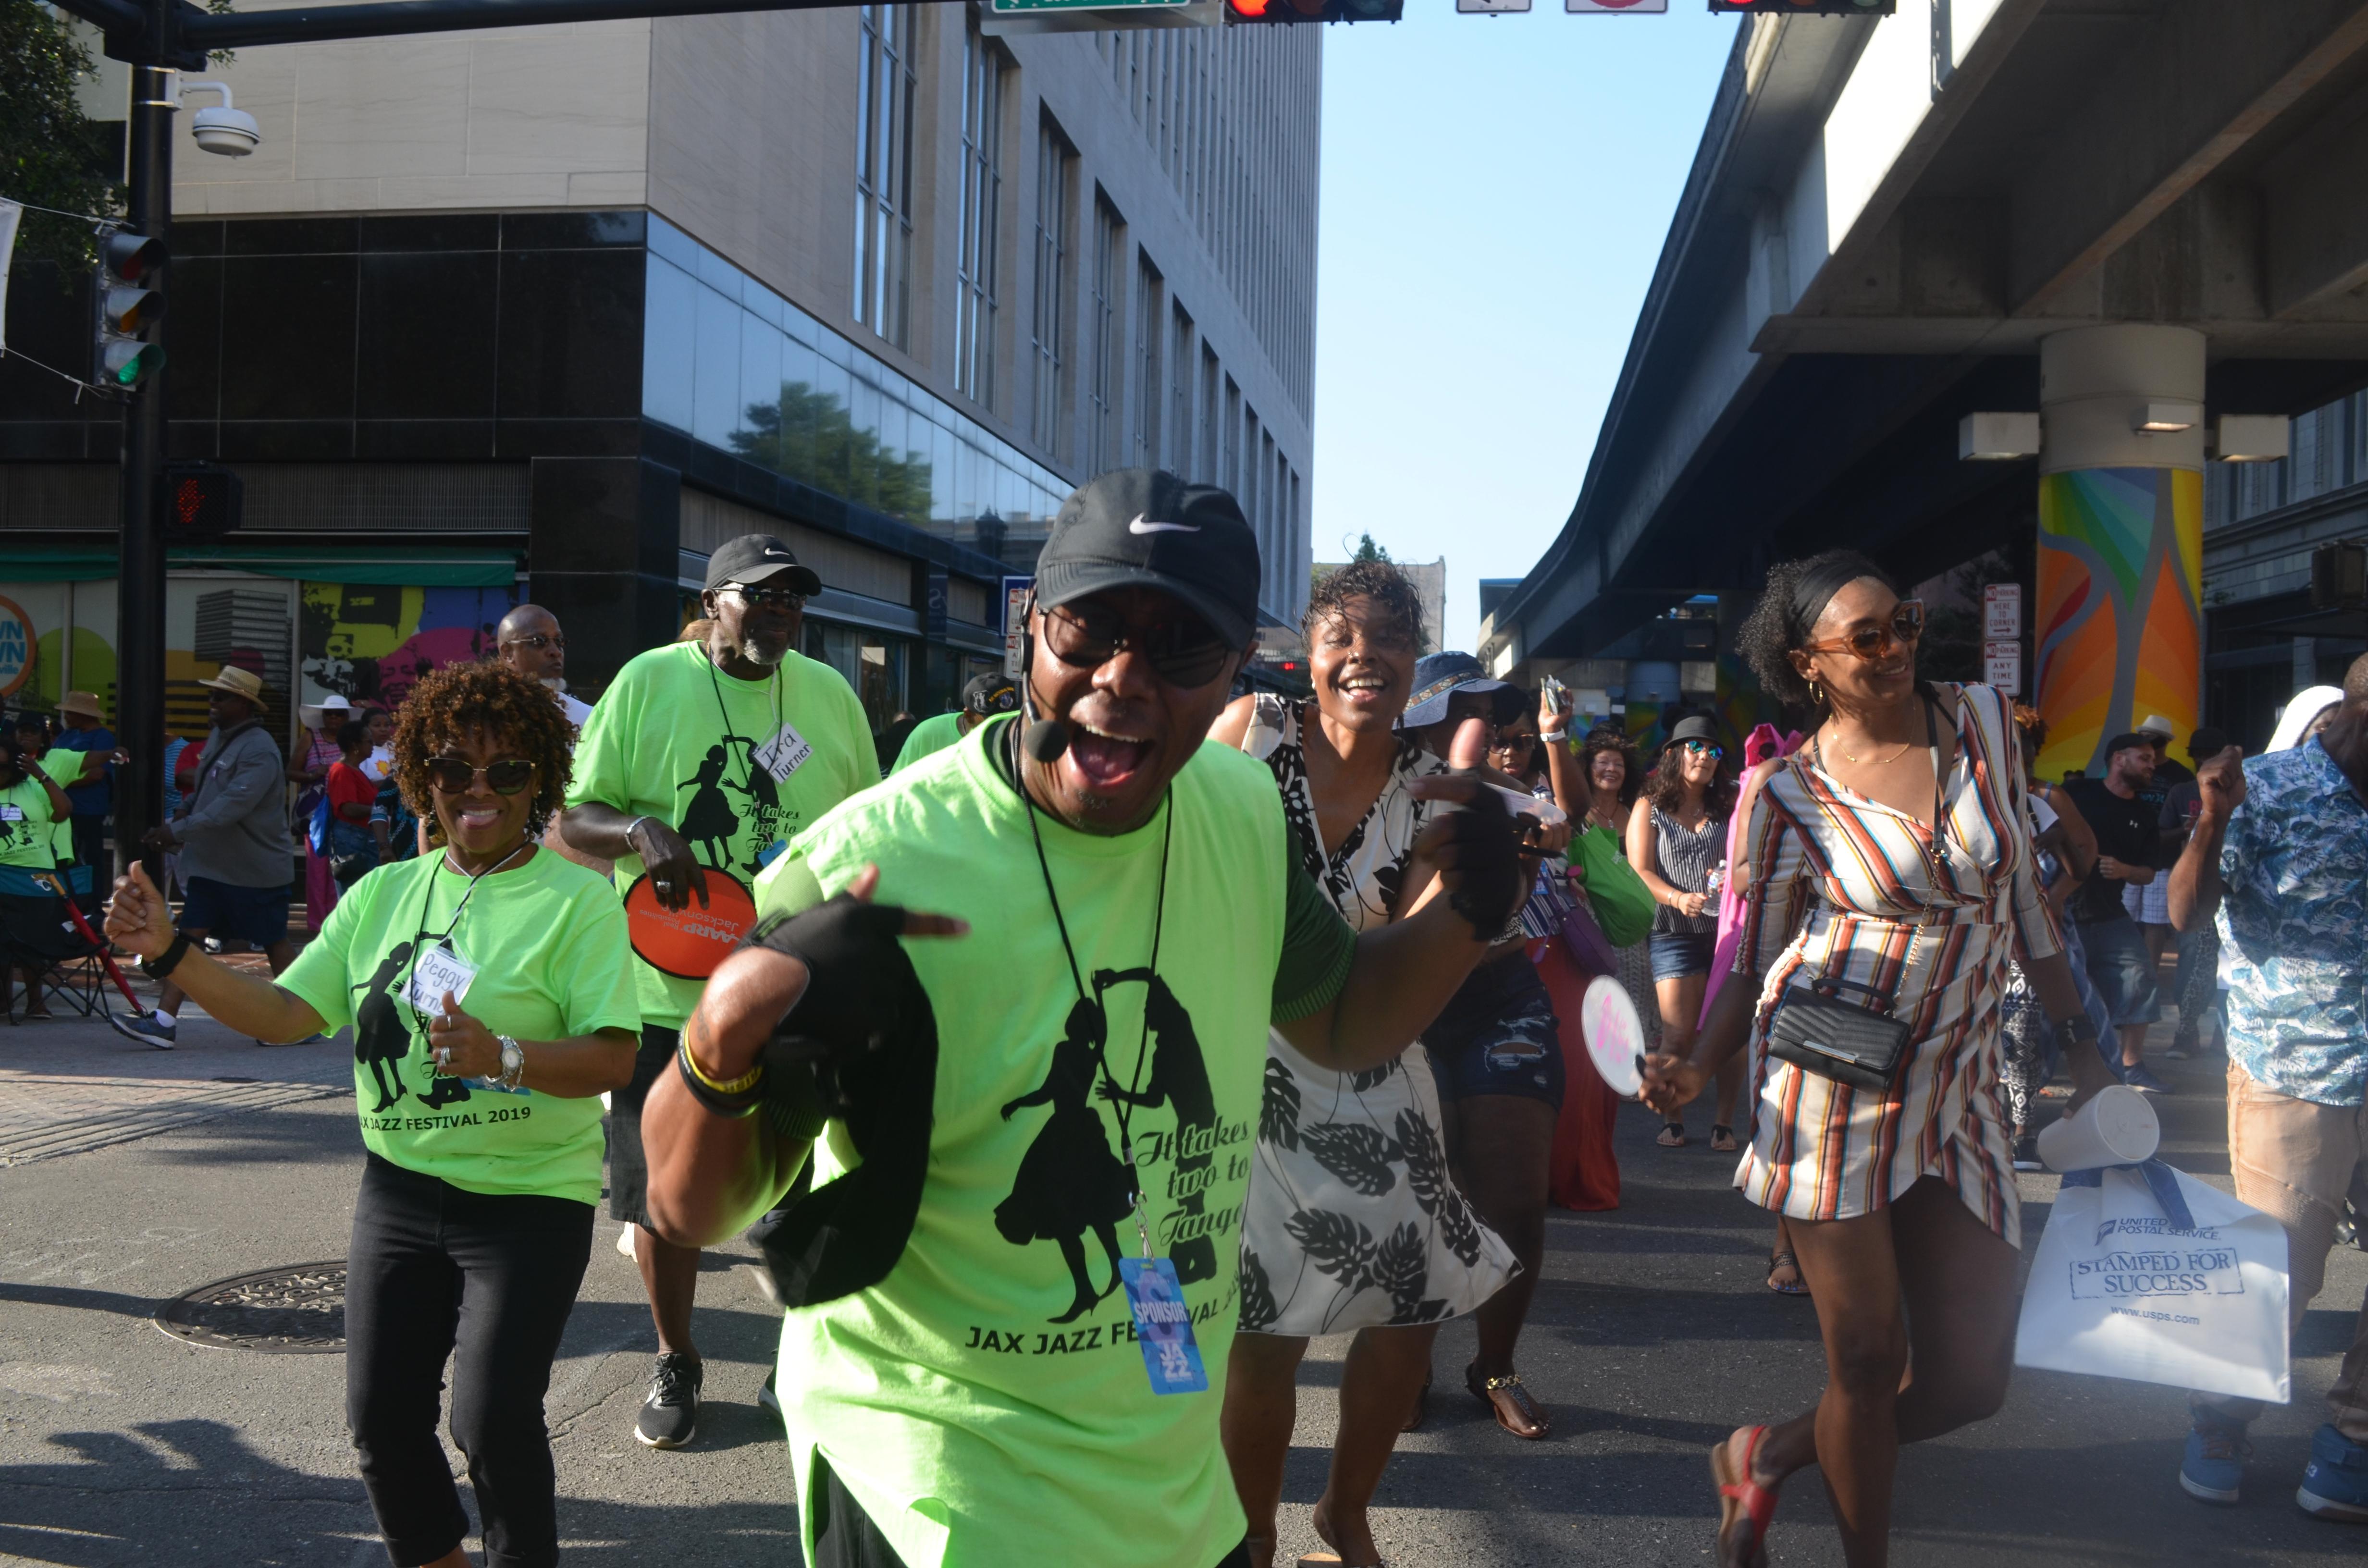 AARP volunteers rock Jacksonville Jazz Festival during Memorial Day 2019